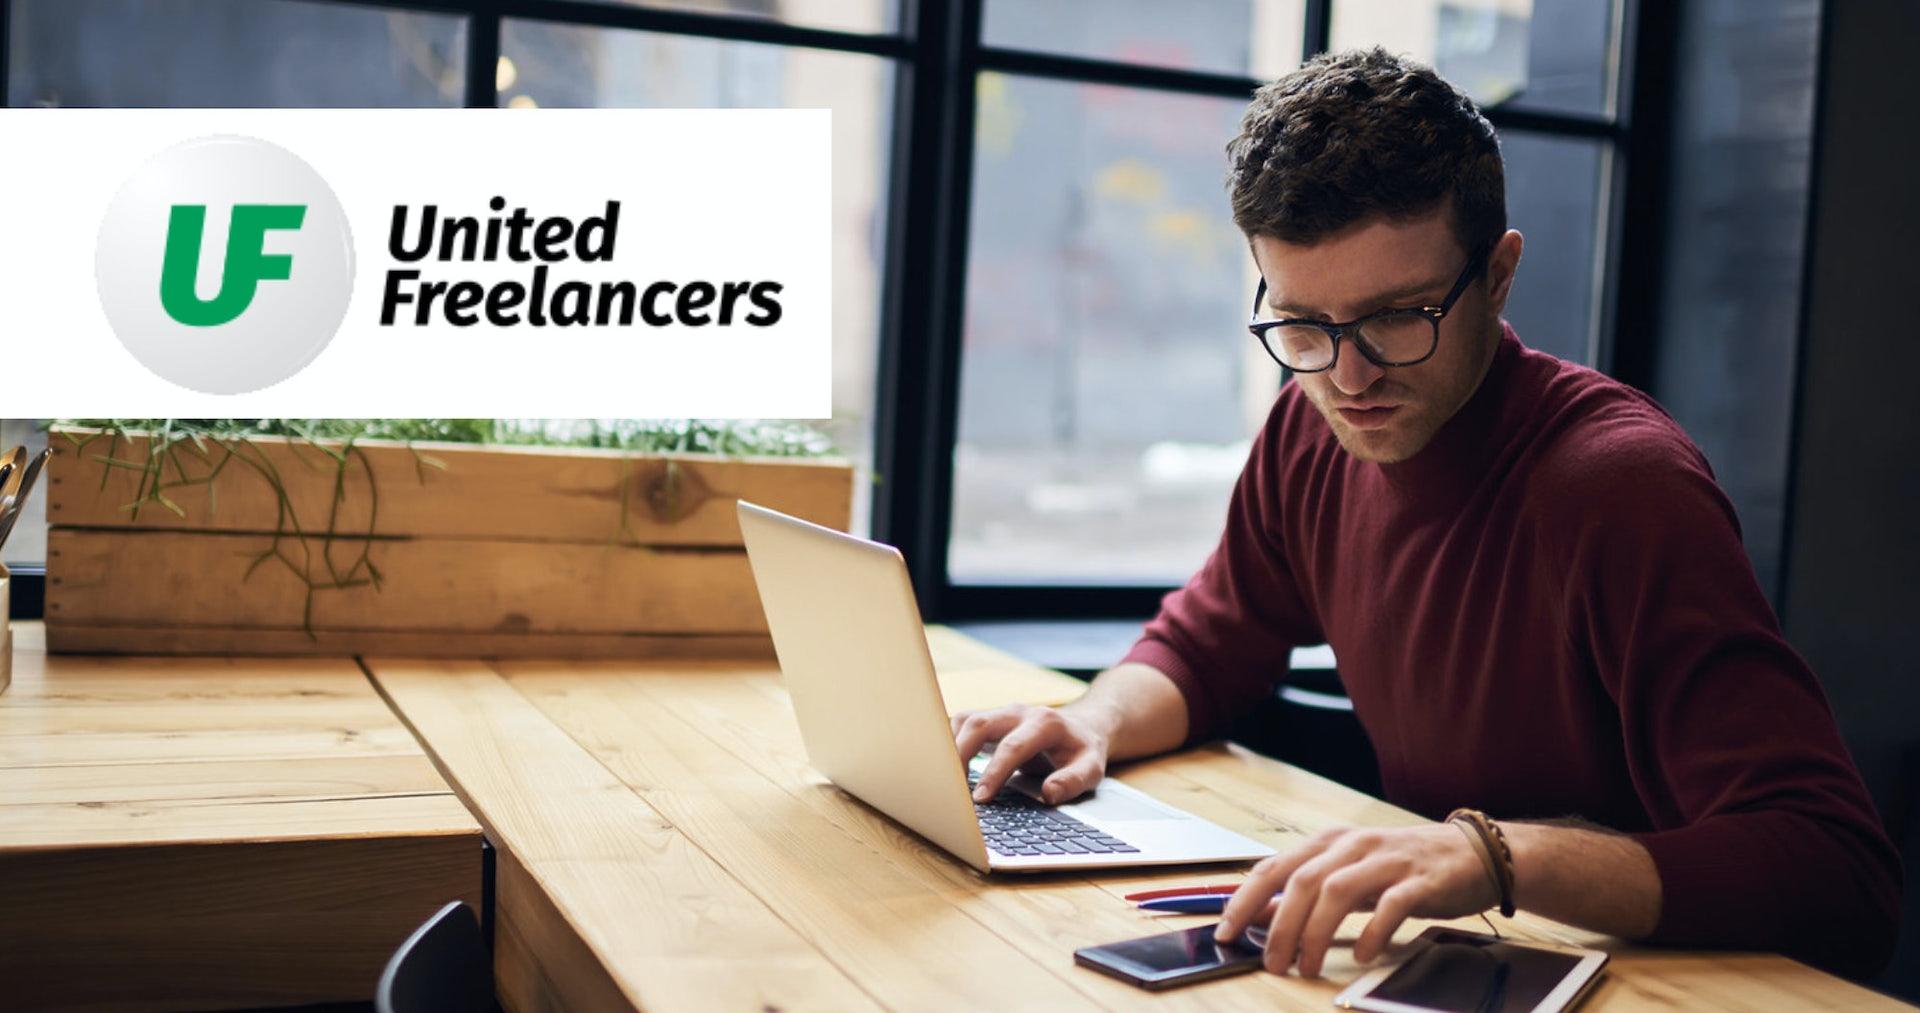 ACV lanceert United Freelancers